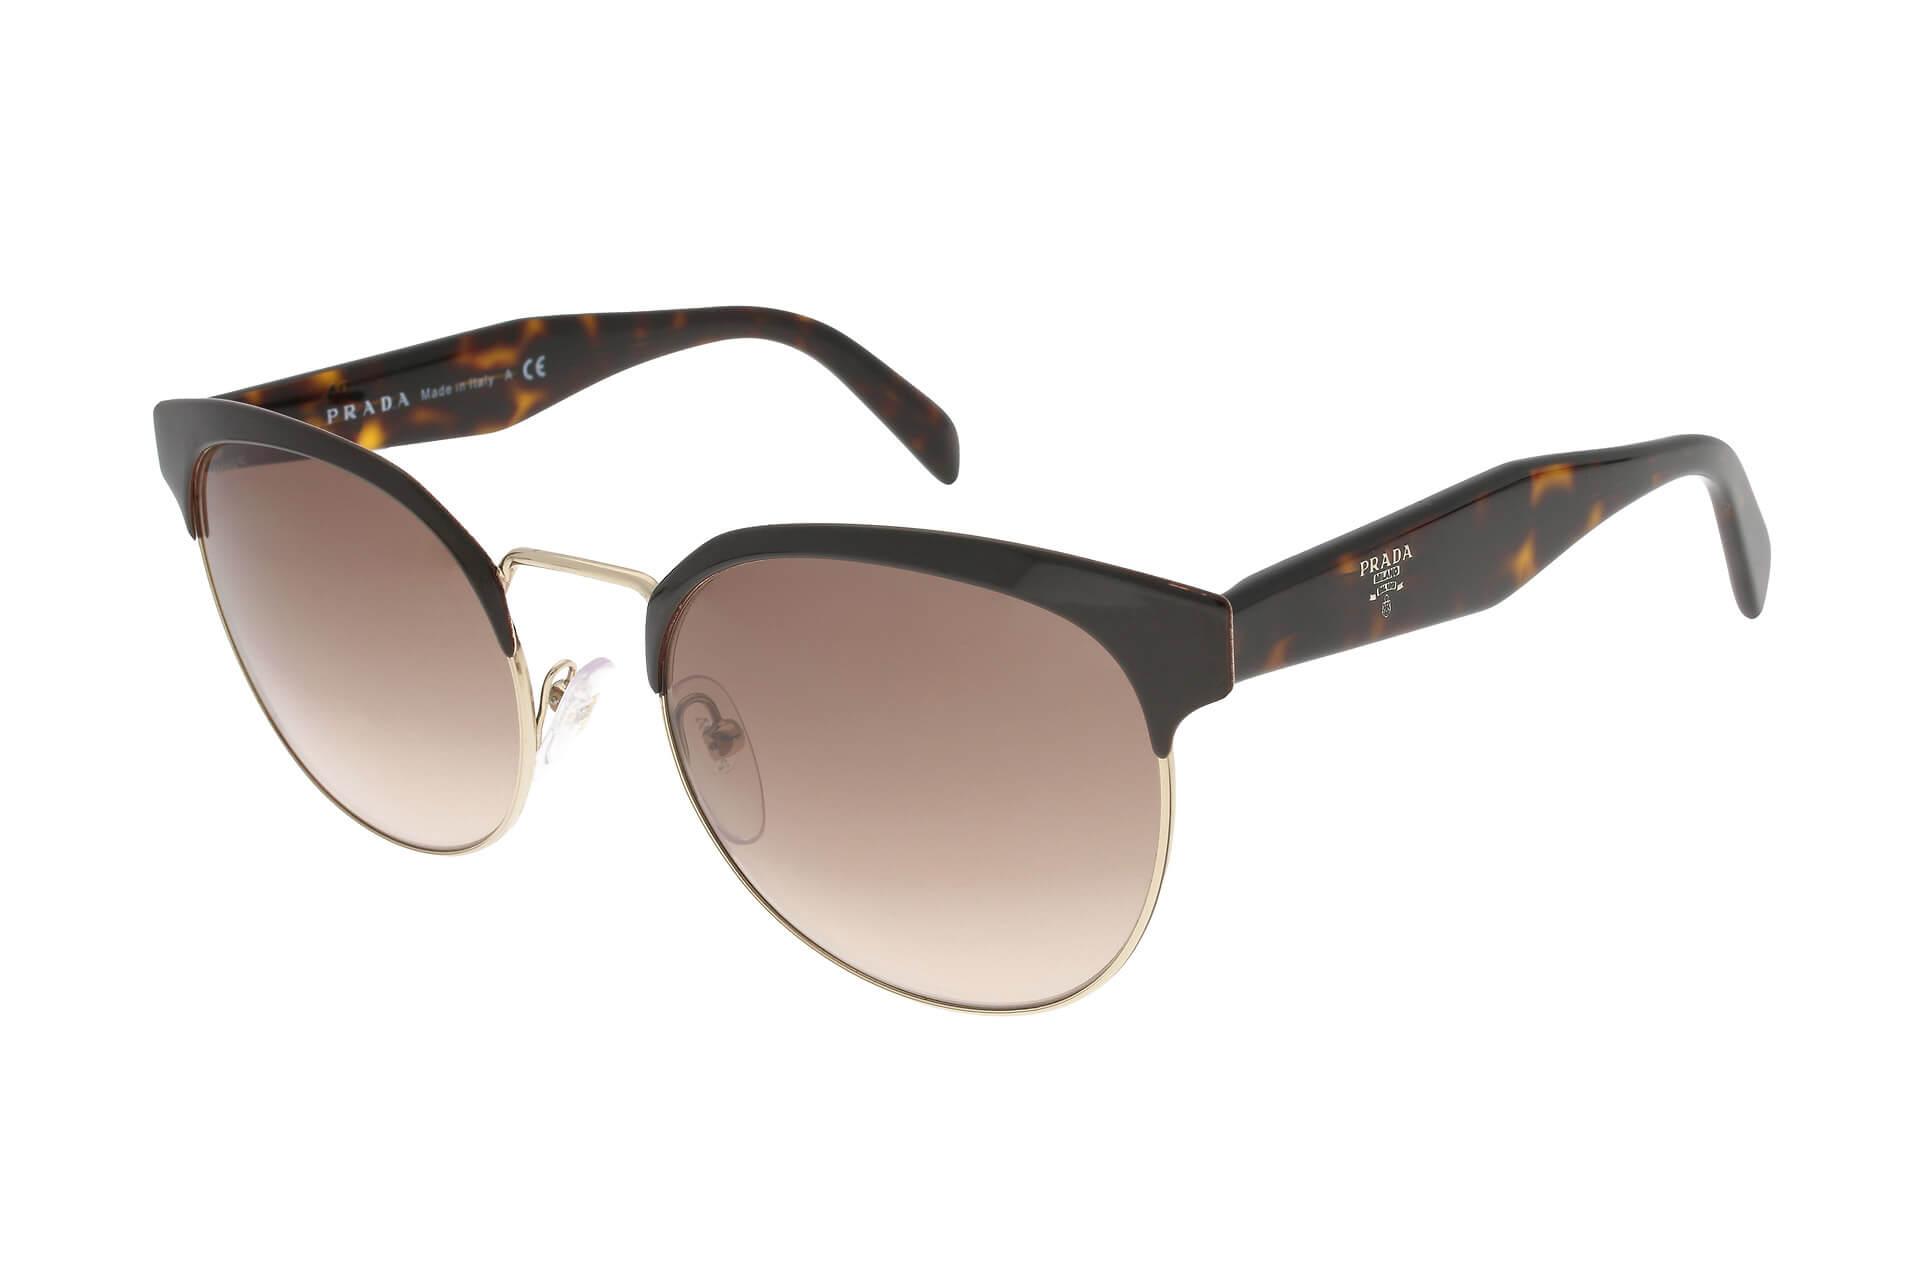 Prada SPR 61T DHO3D0 Sonnenbrille Damenbrille 2AhsWg